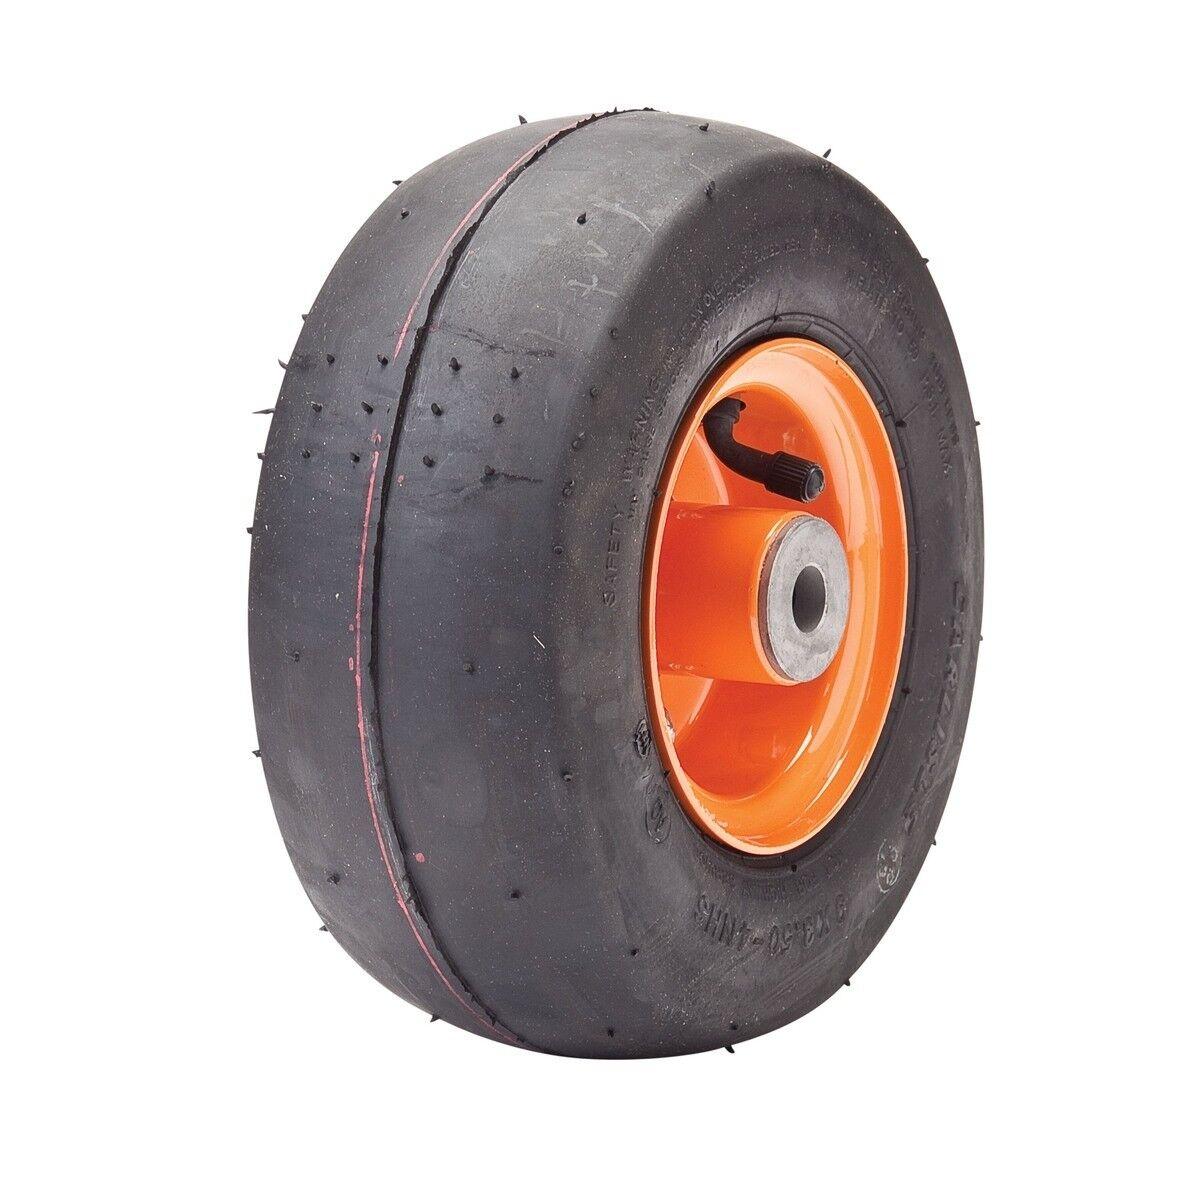 Oregon Cubierta Conjunto de Ruedas, Neumático sustituye Original Equipment Manufacturer Scag 48307 72-795